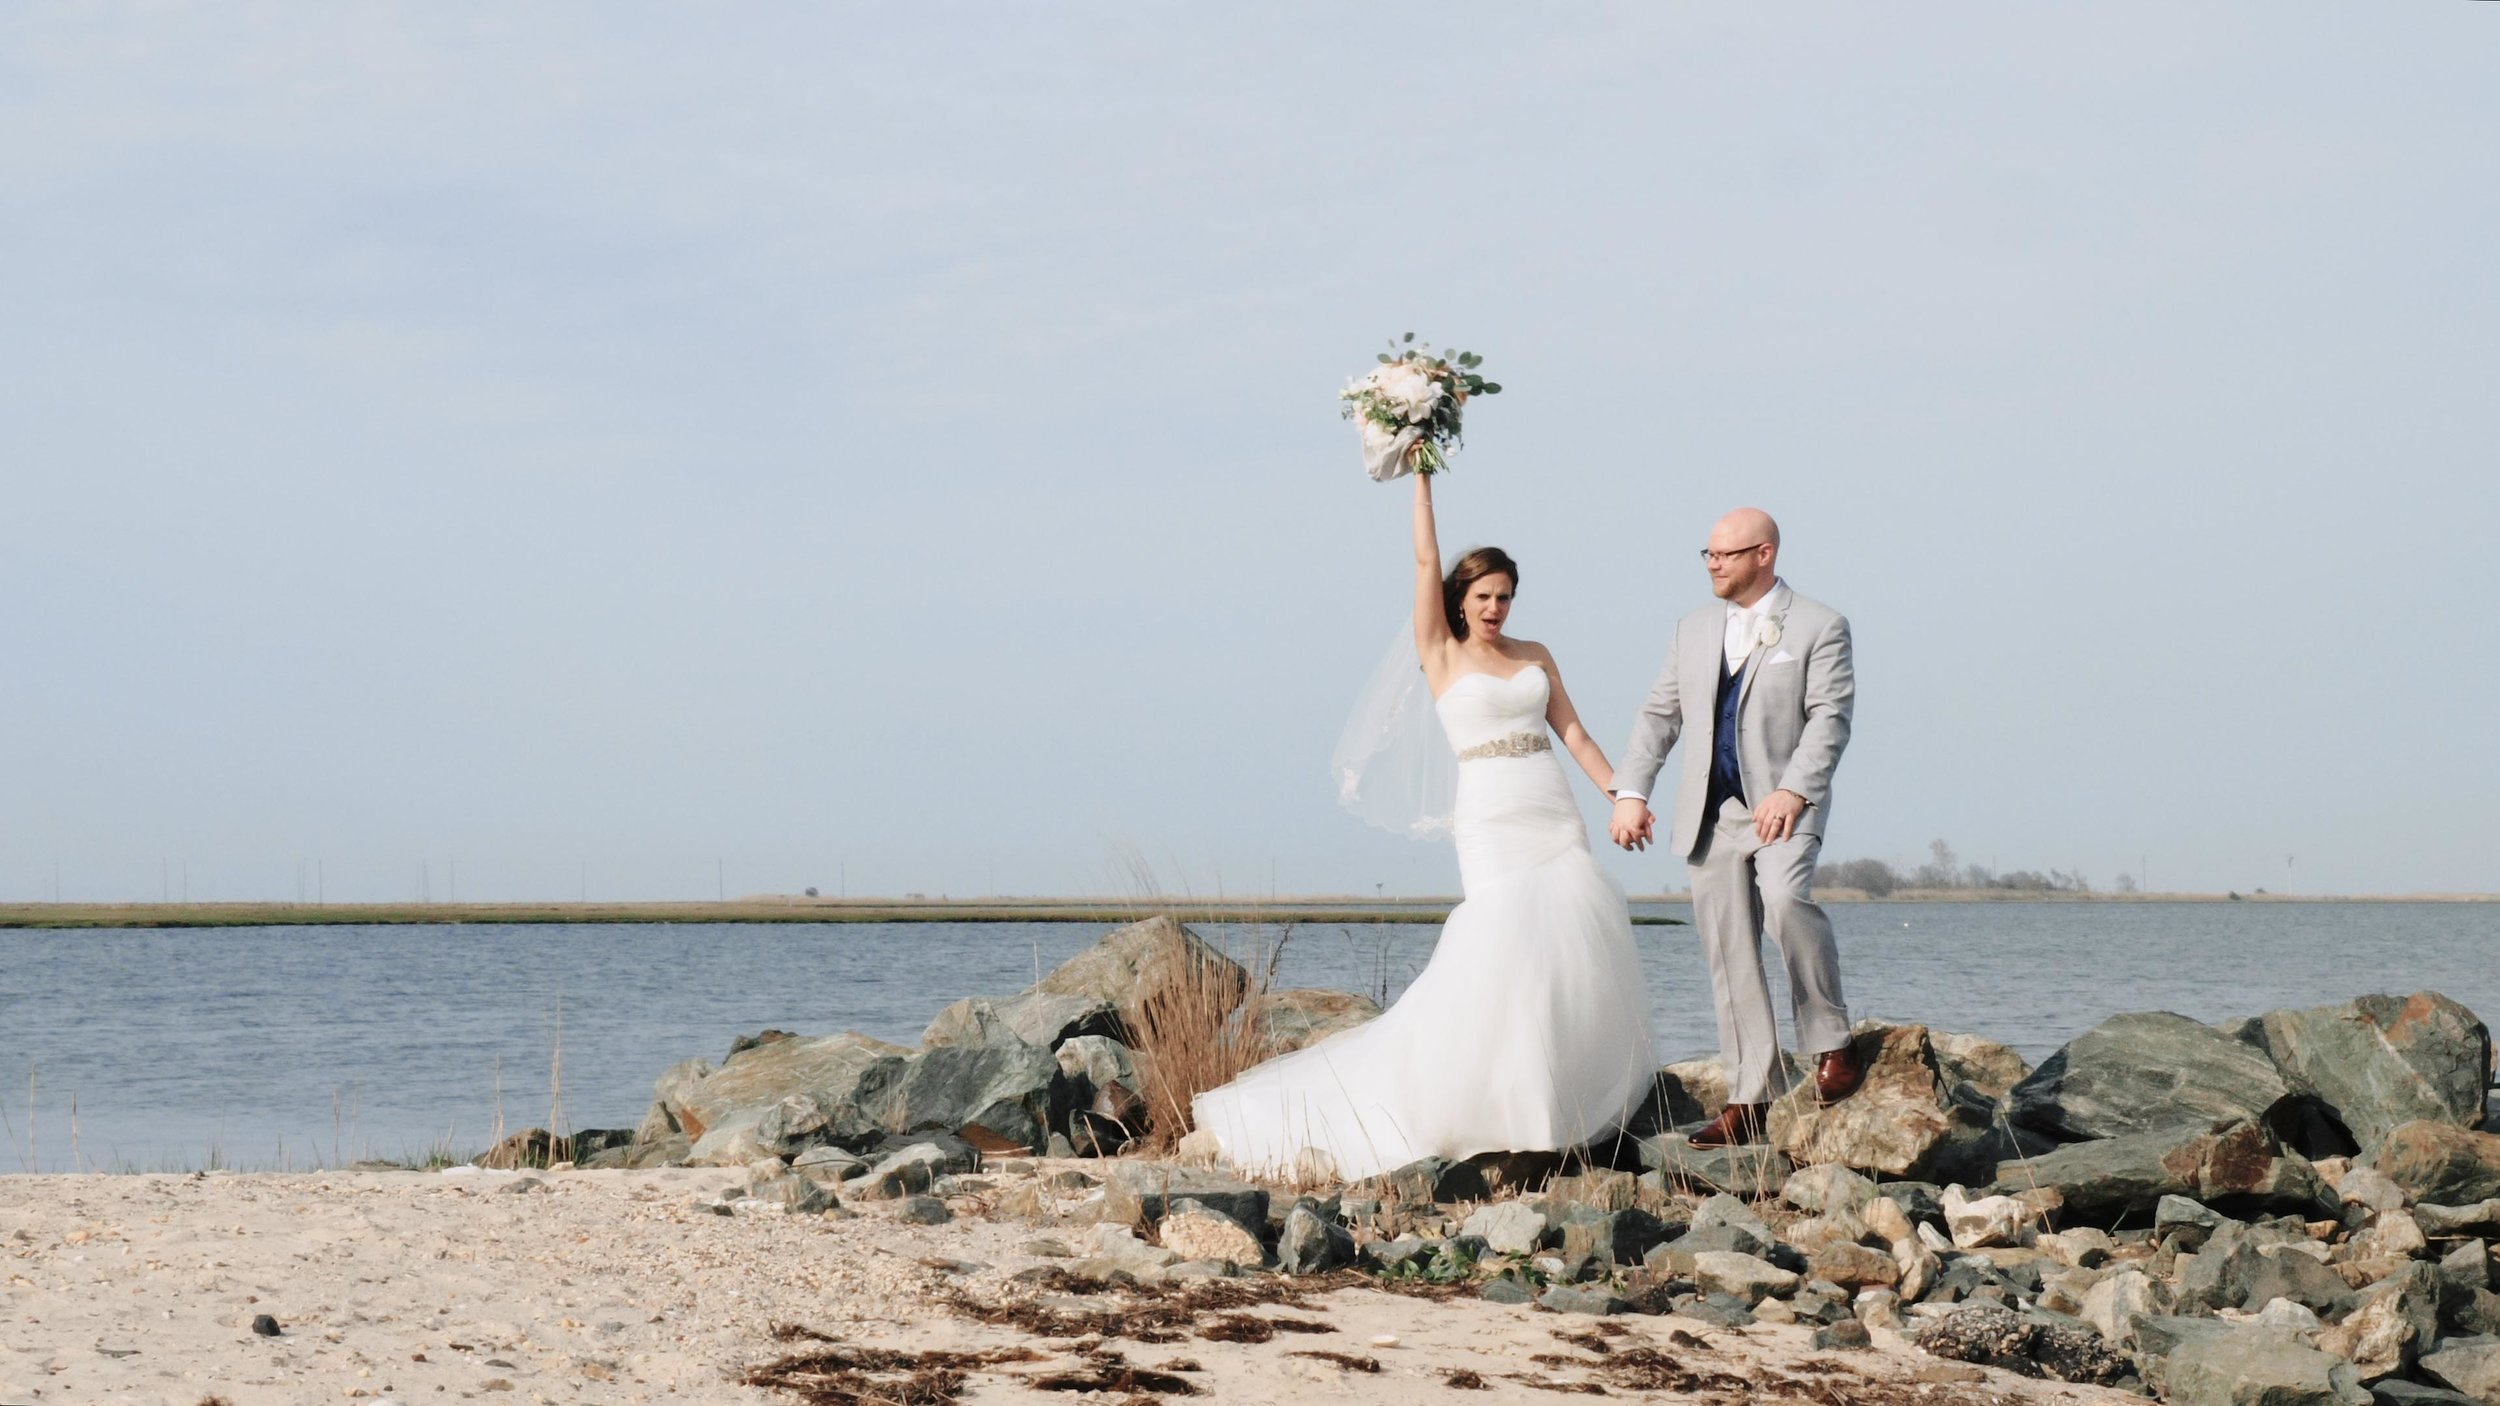 Tonemedia, NJ Wedding Videographer, NJ Wedding Videopgraphy, NJ Wedding Video, Mallard Island Yacht Club,Mallard Island Yacht Club Wedding, Mallard Island Wedding